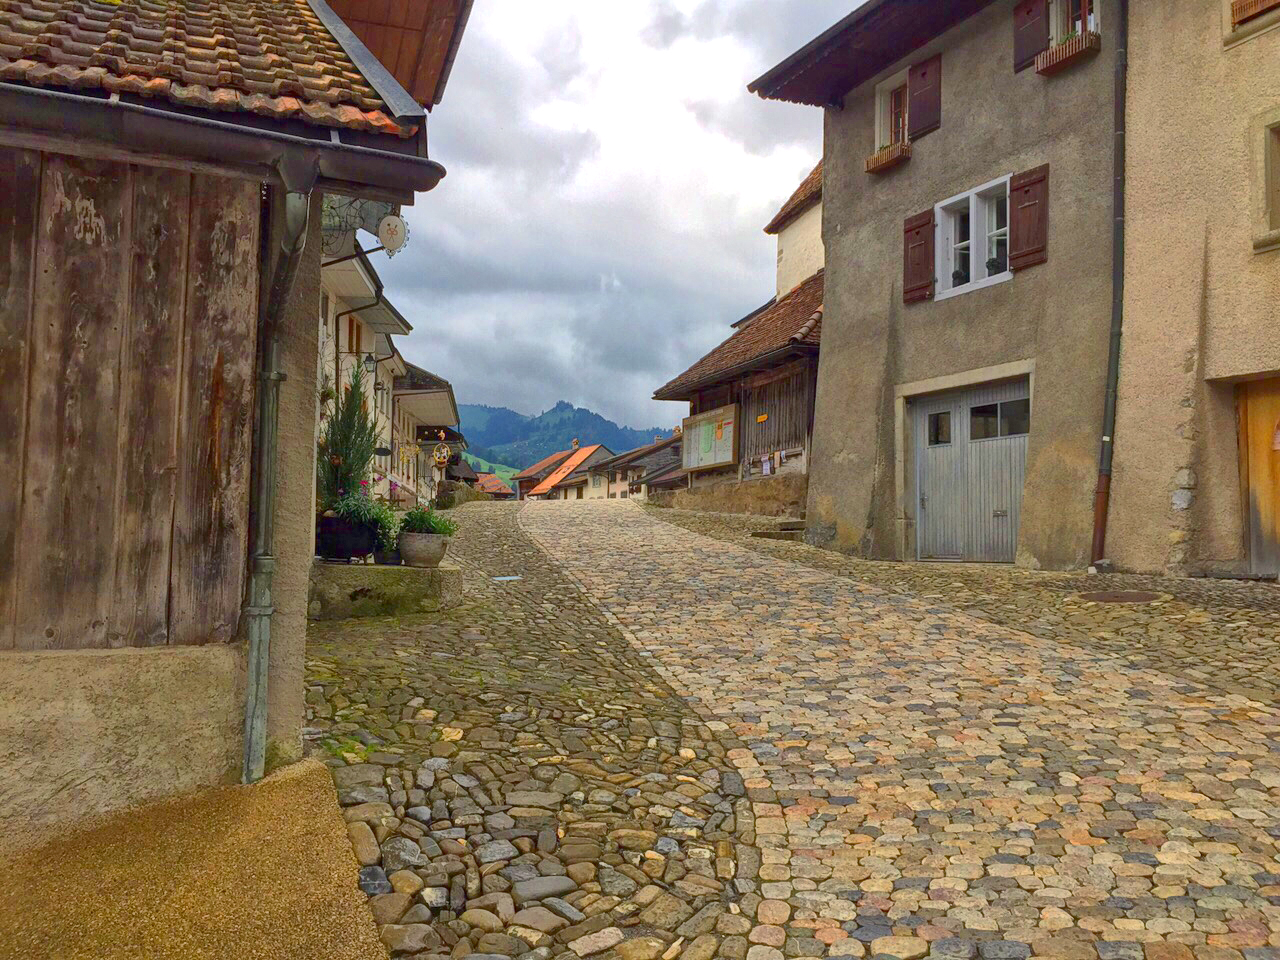 cobble stone gruyere, gruyere, Saane river, Switzerland